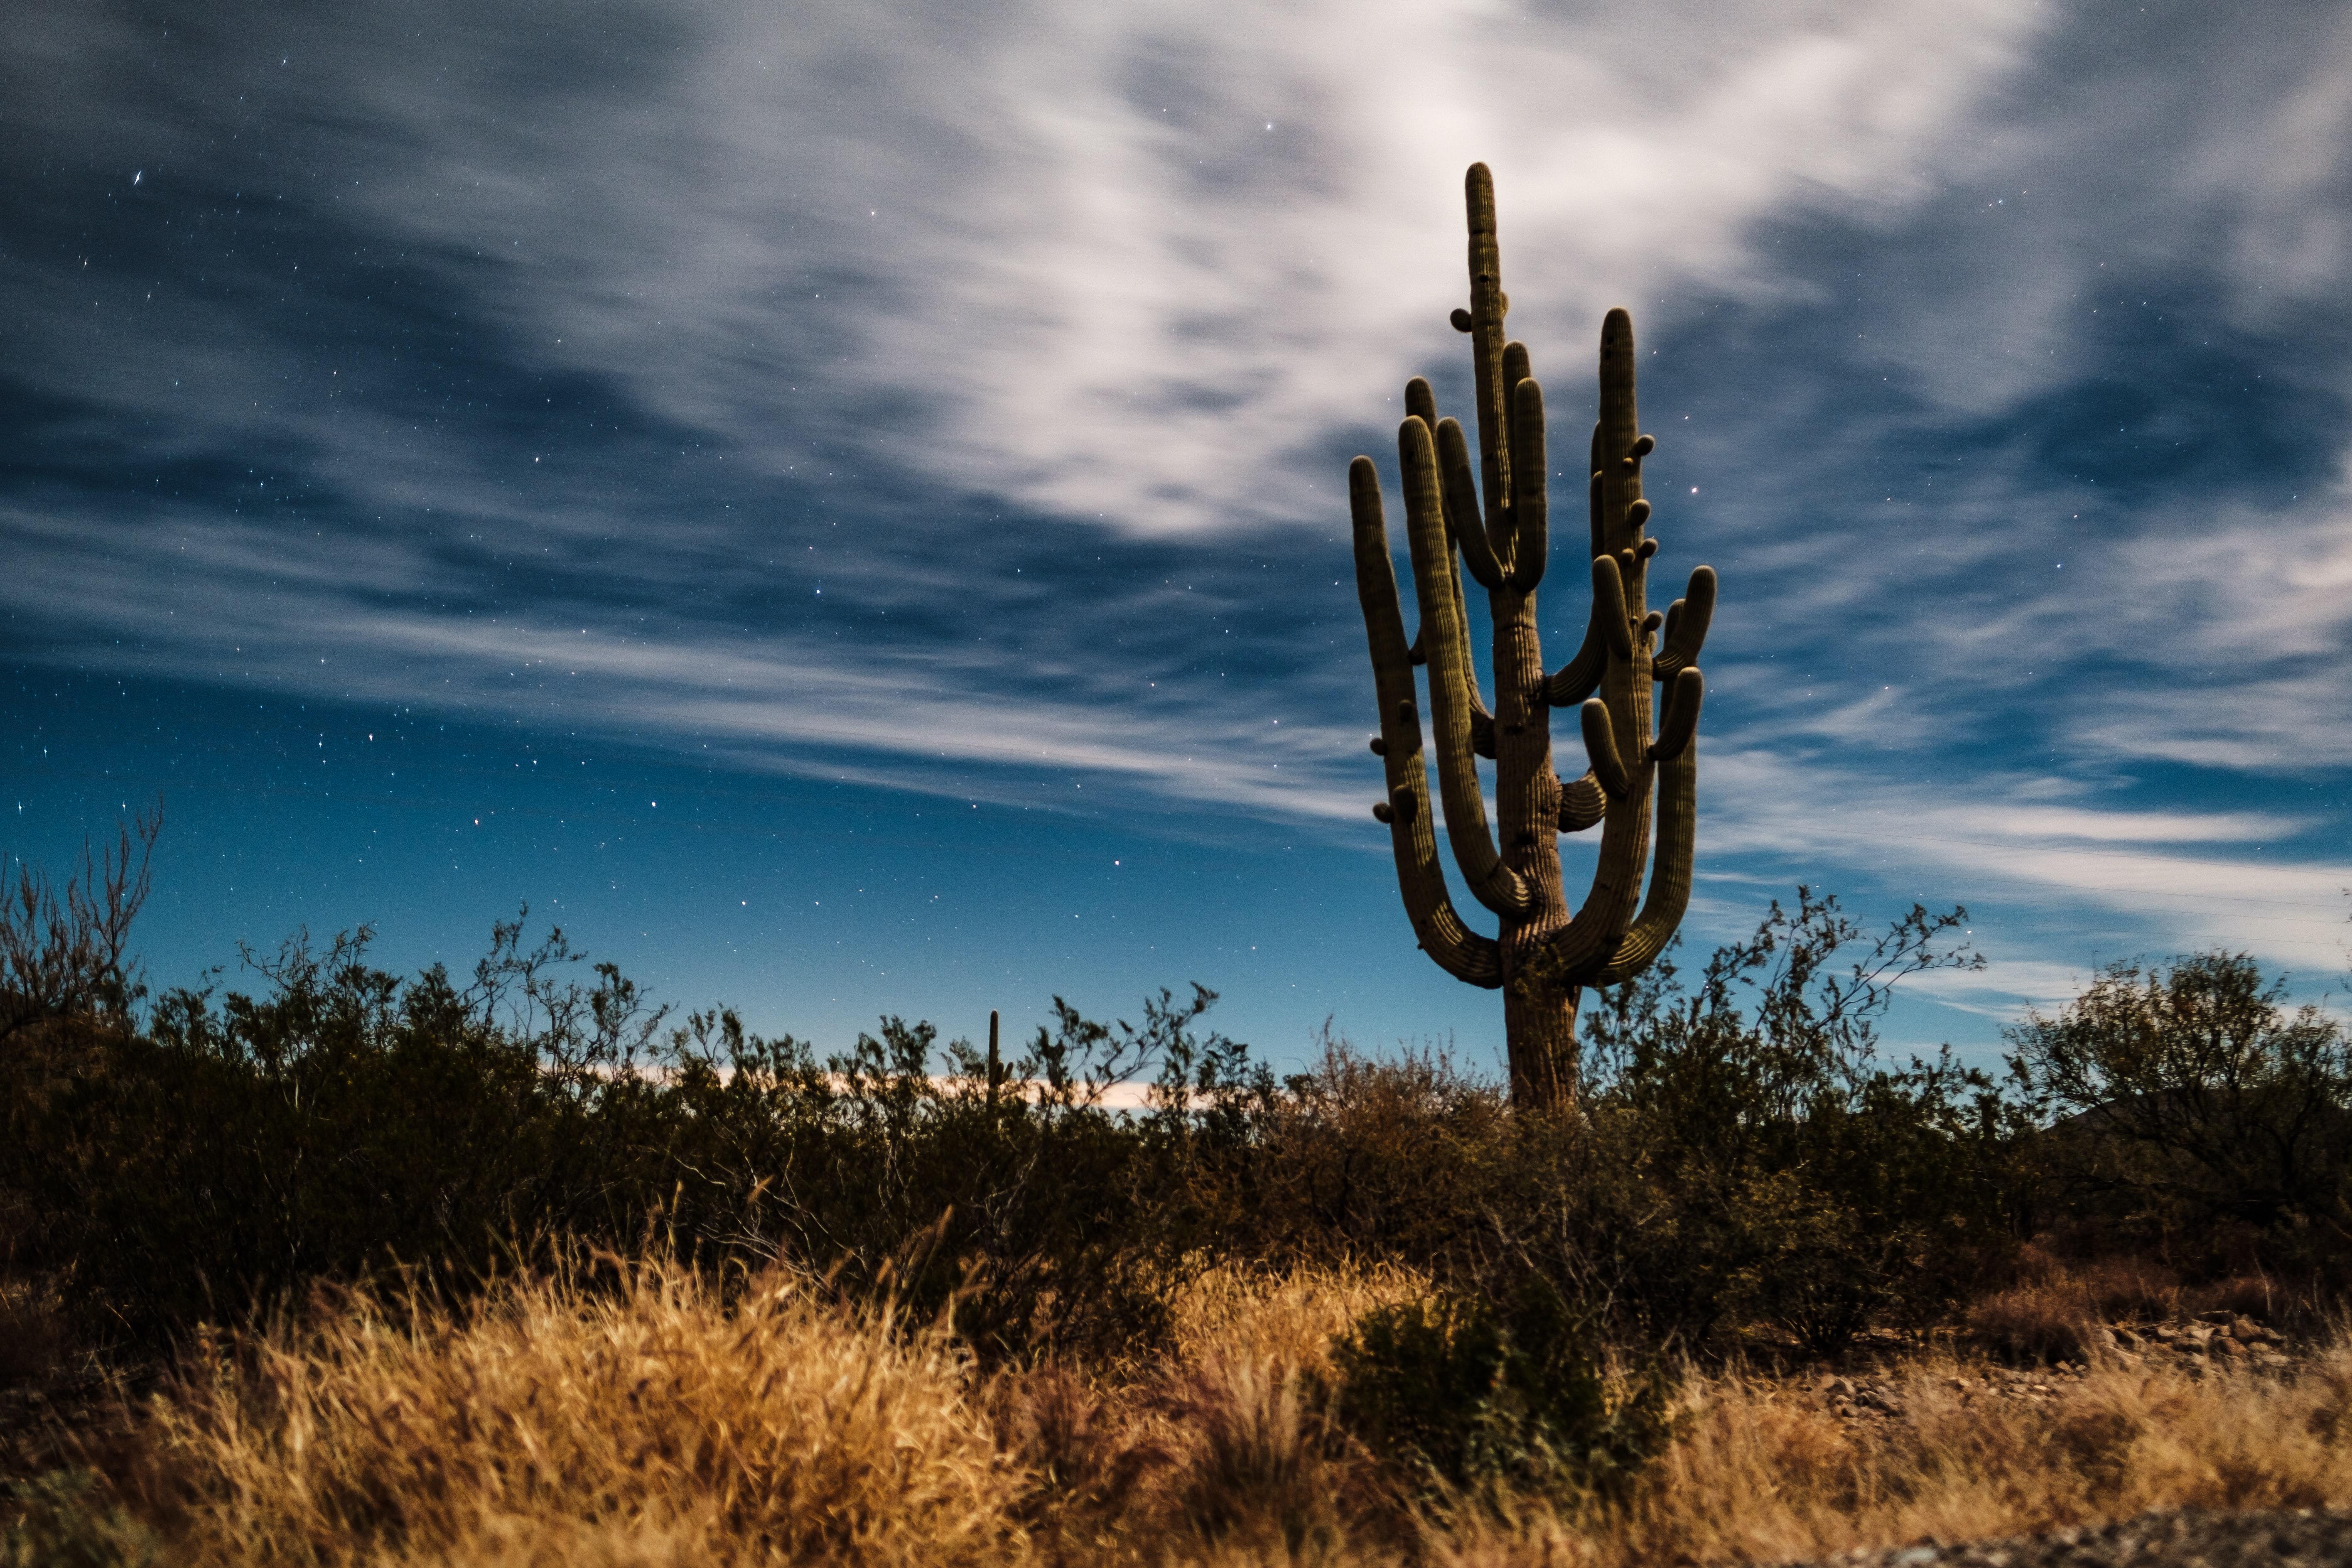 15 Things to do in Tucson, Arizona